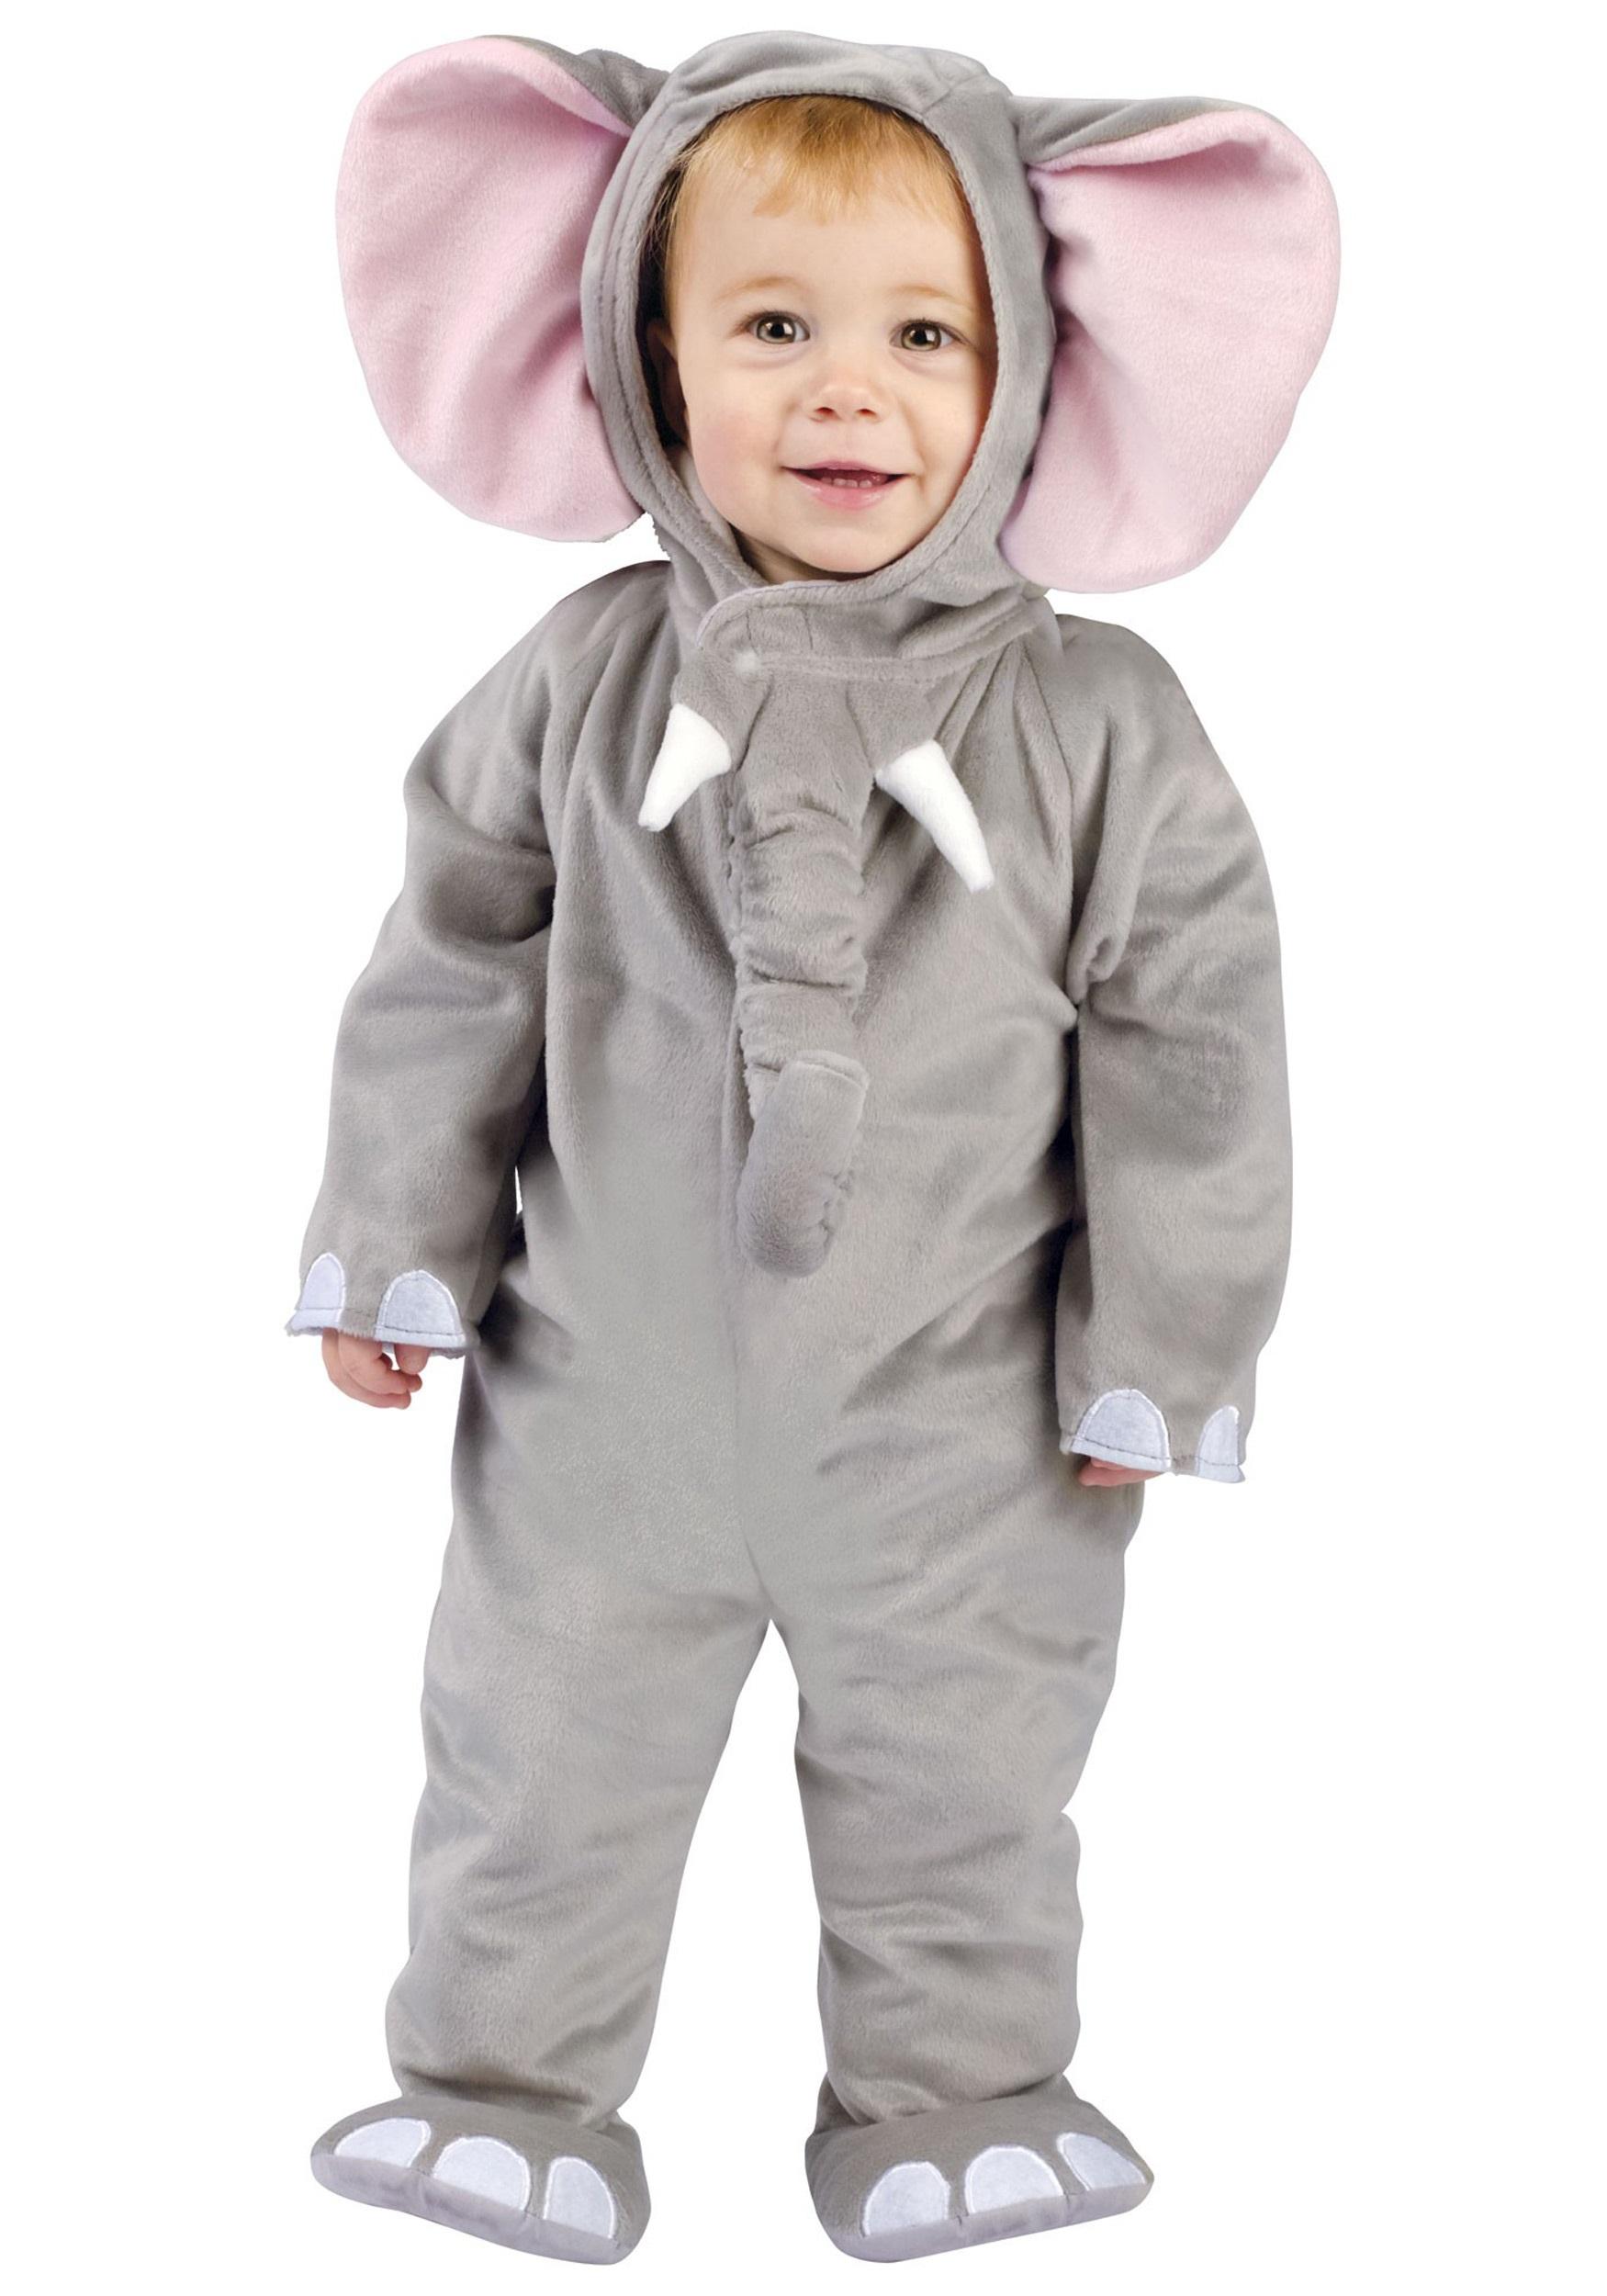 Pig Halloween Costume Toddler